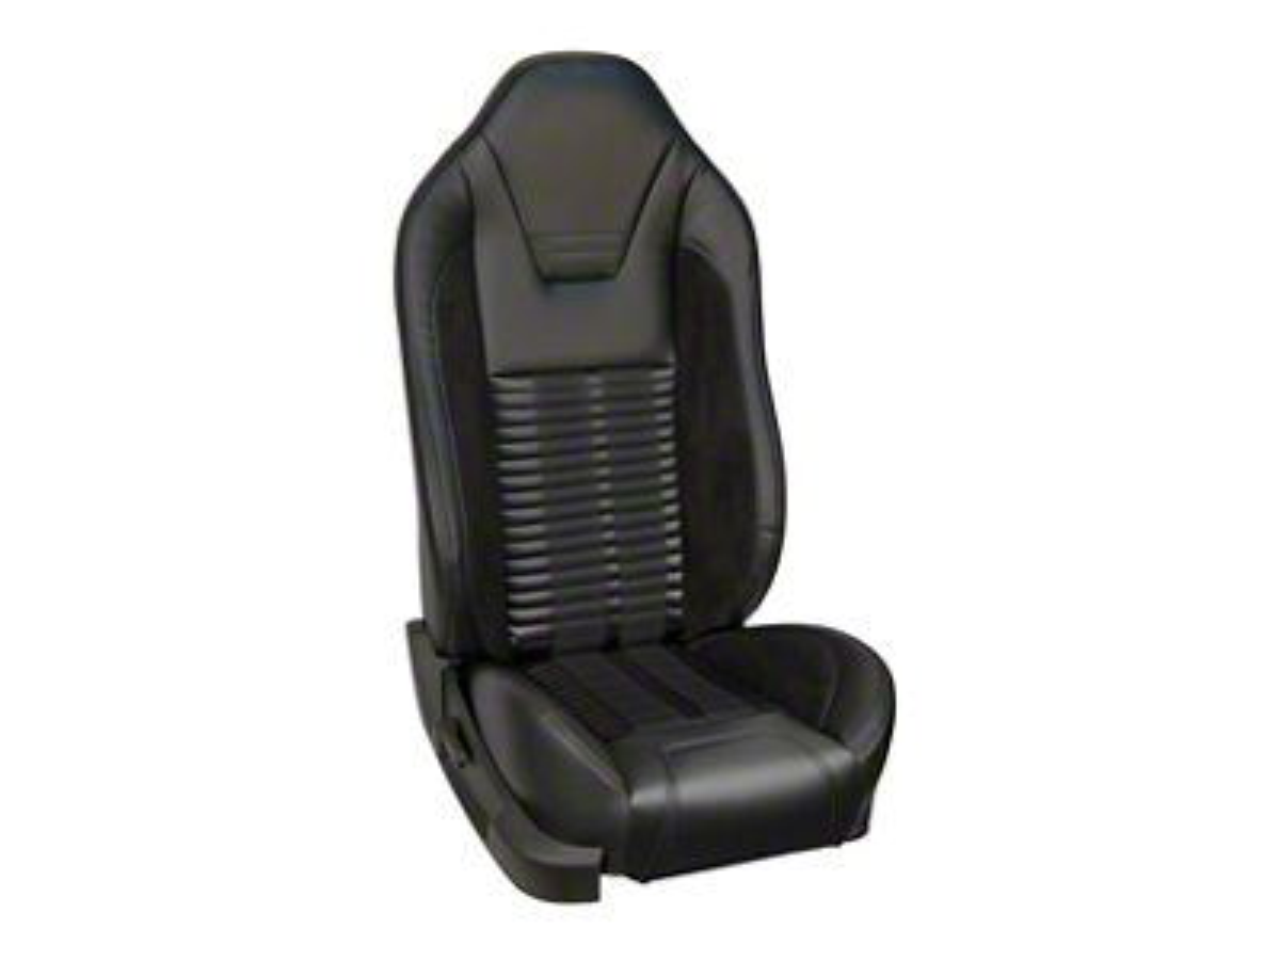 TMI Premium Sport R500 Upholstery & Foam Kit for Airbag Equipped Seats - Black Vinyl & Black Stripe/Stitch (13-14 GT)